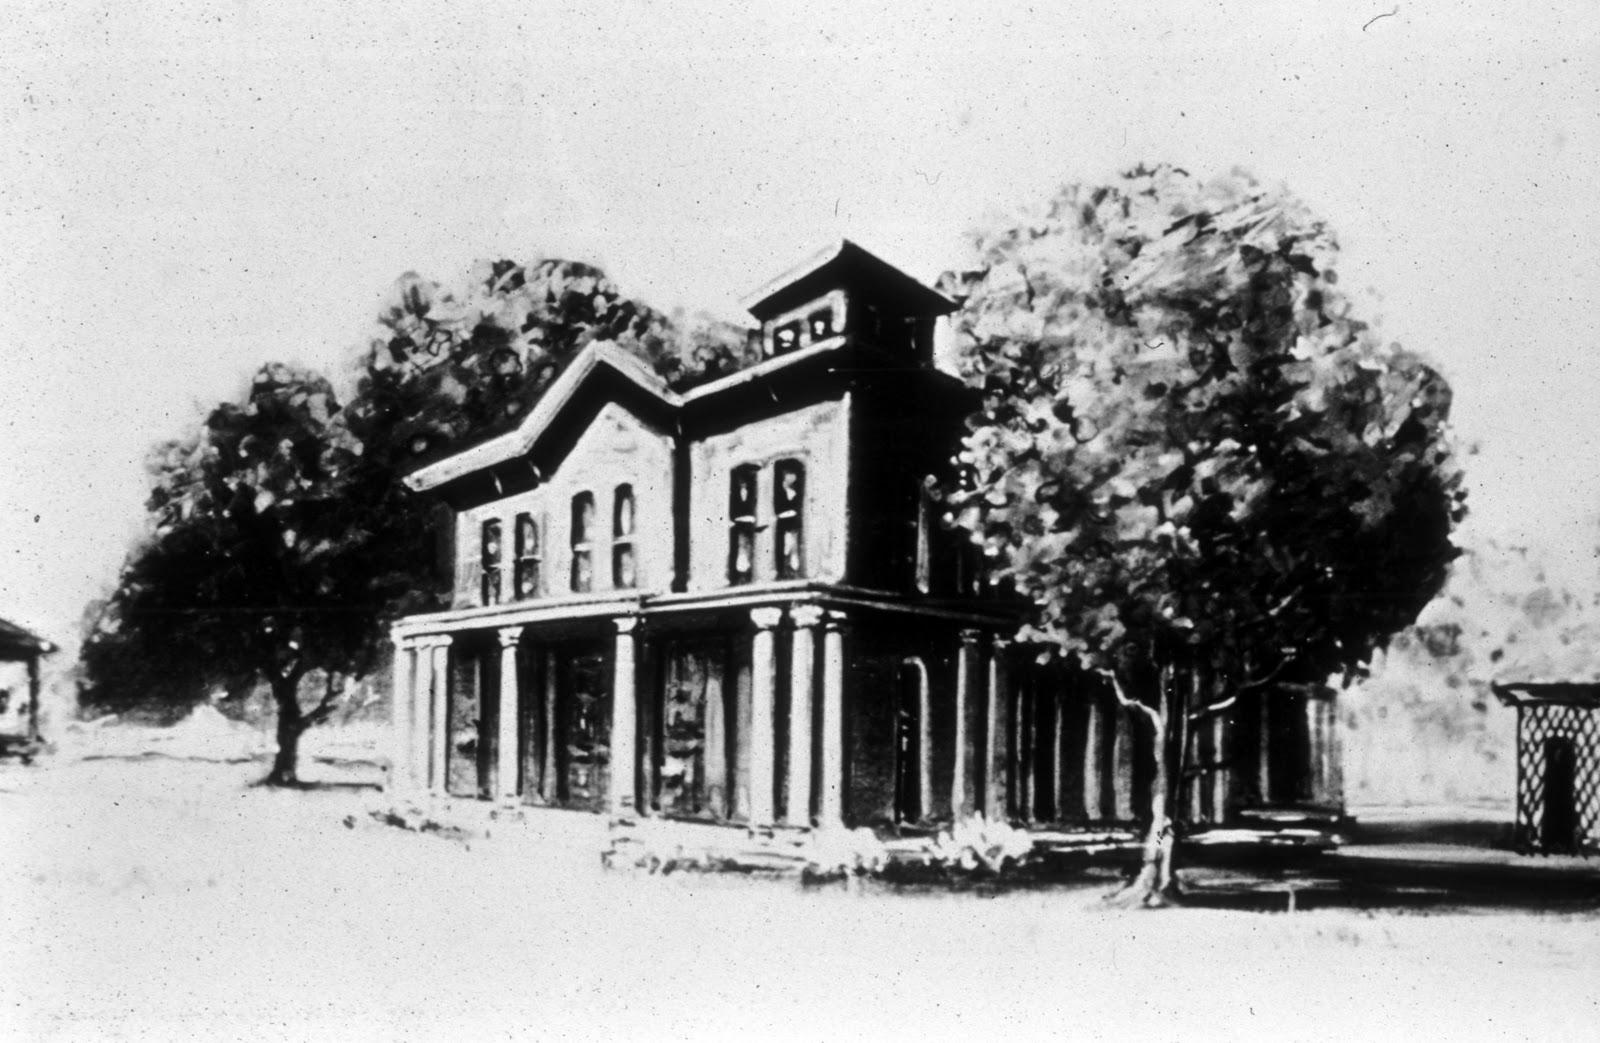 tour america's history: jane addams hull-house museum